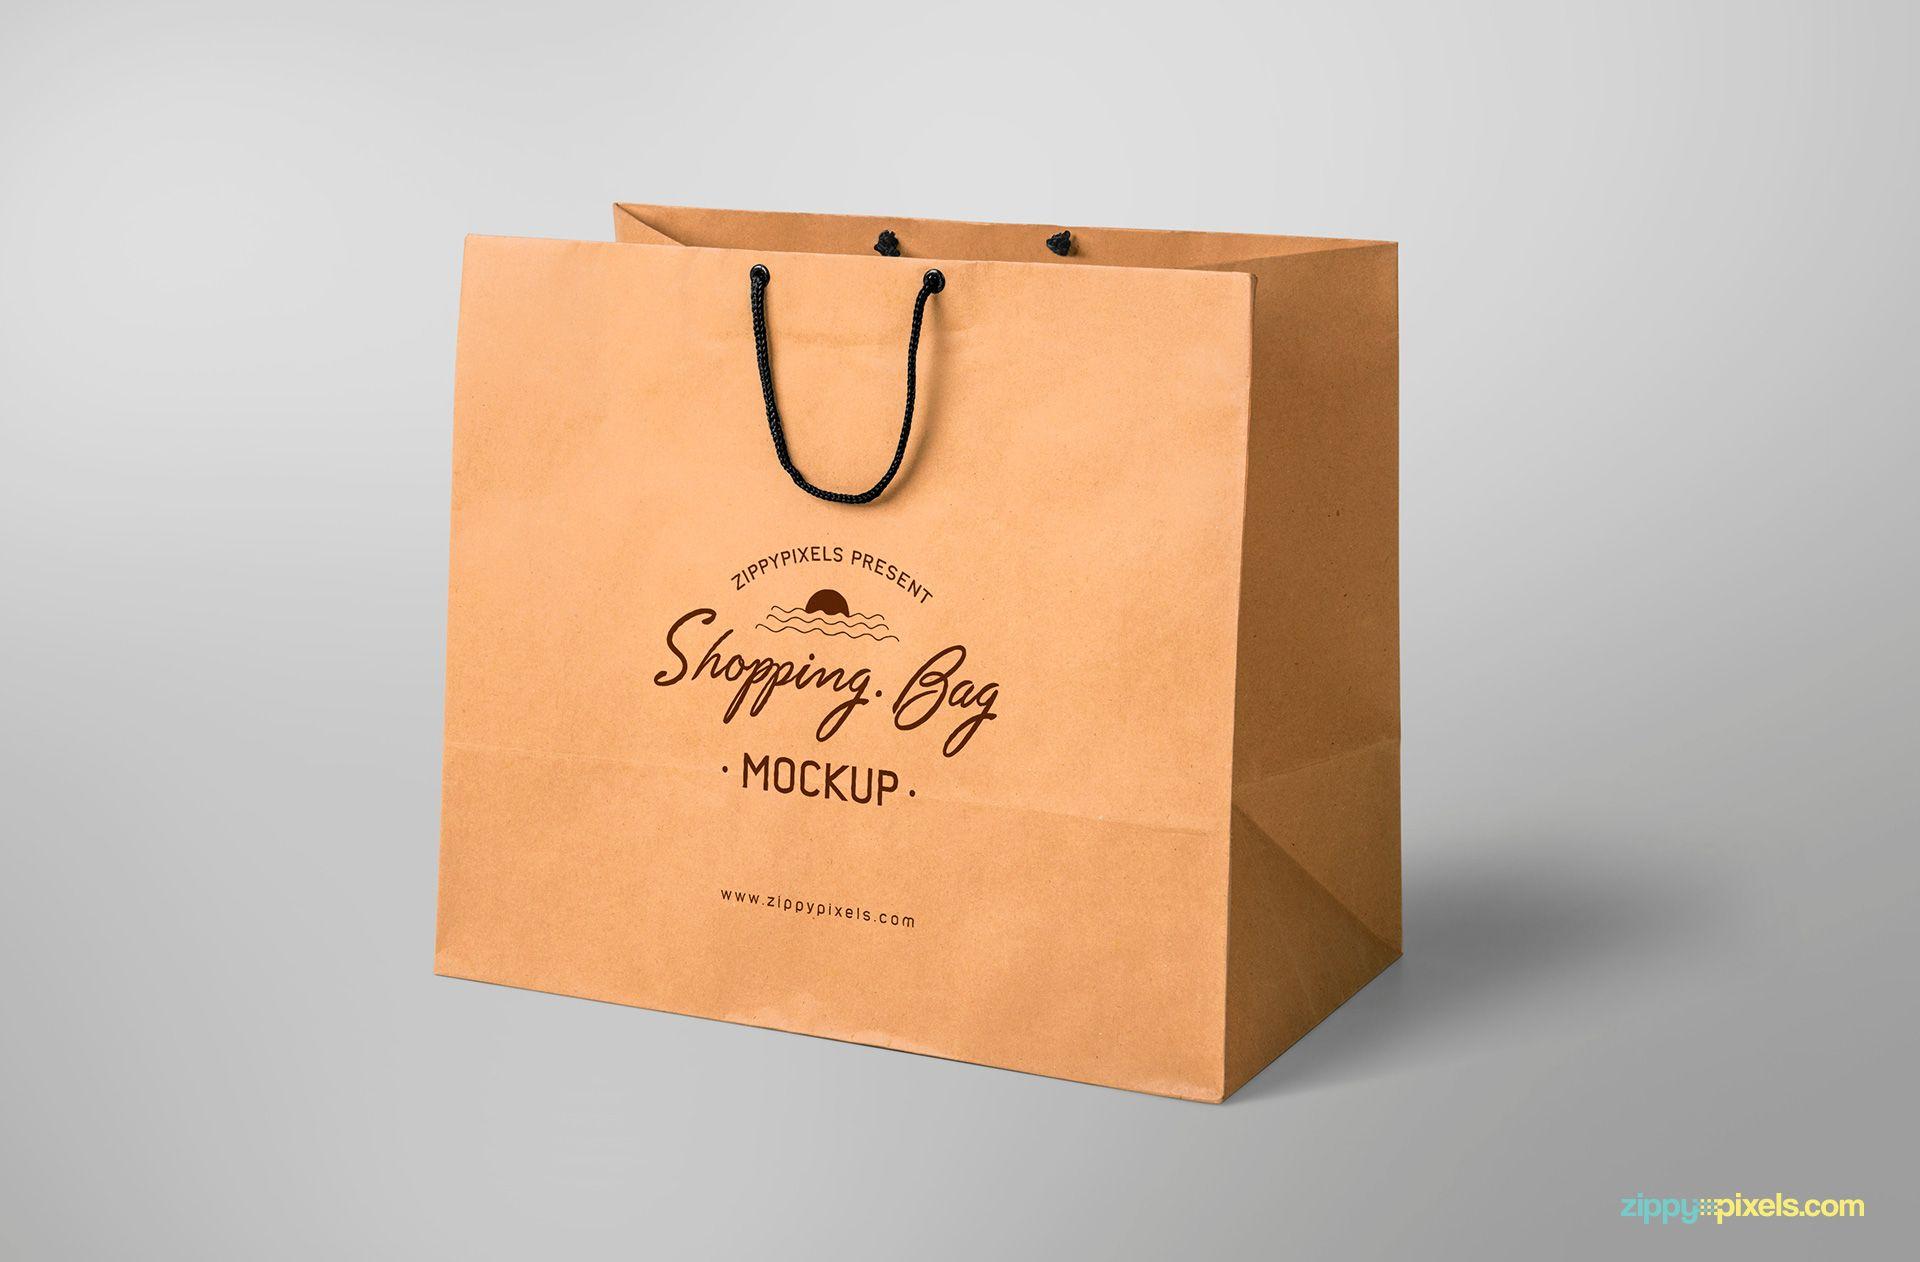 Download Free Shopping Bag Mockup Zippypixels Bag Mockup Mockup Mockup Free Psd